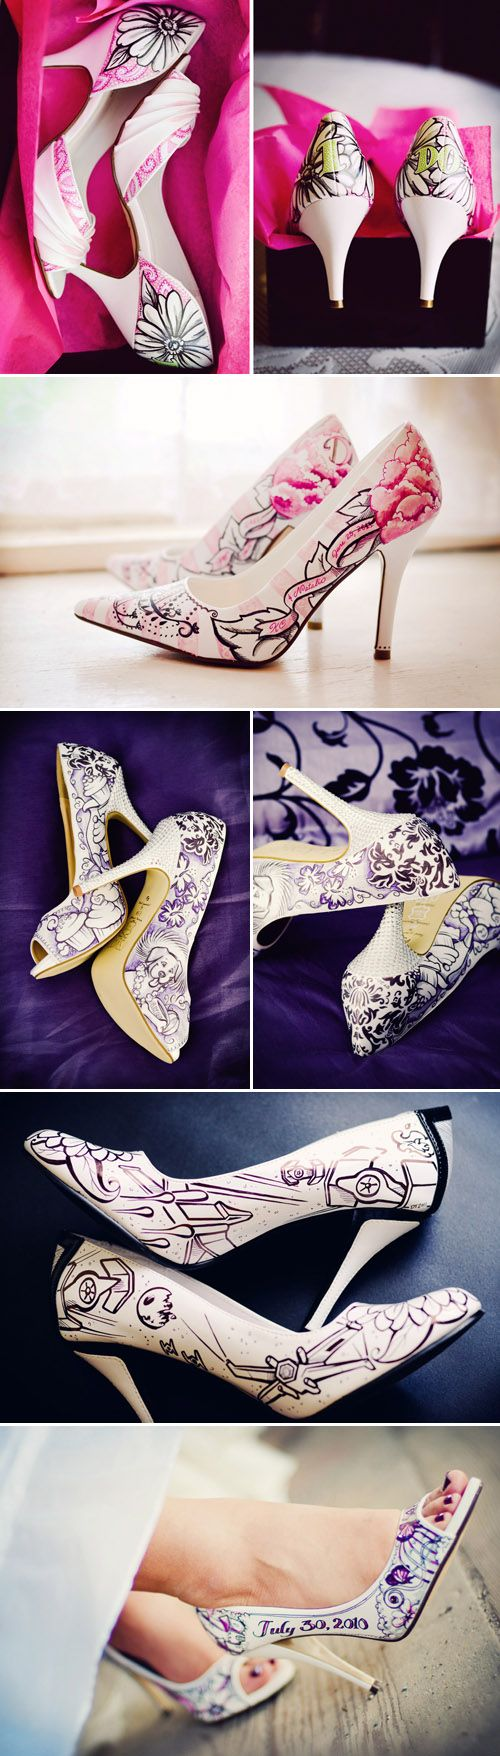 Cute Star Wars shoes